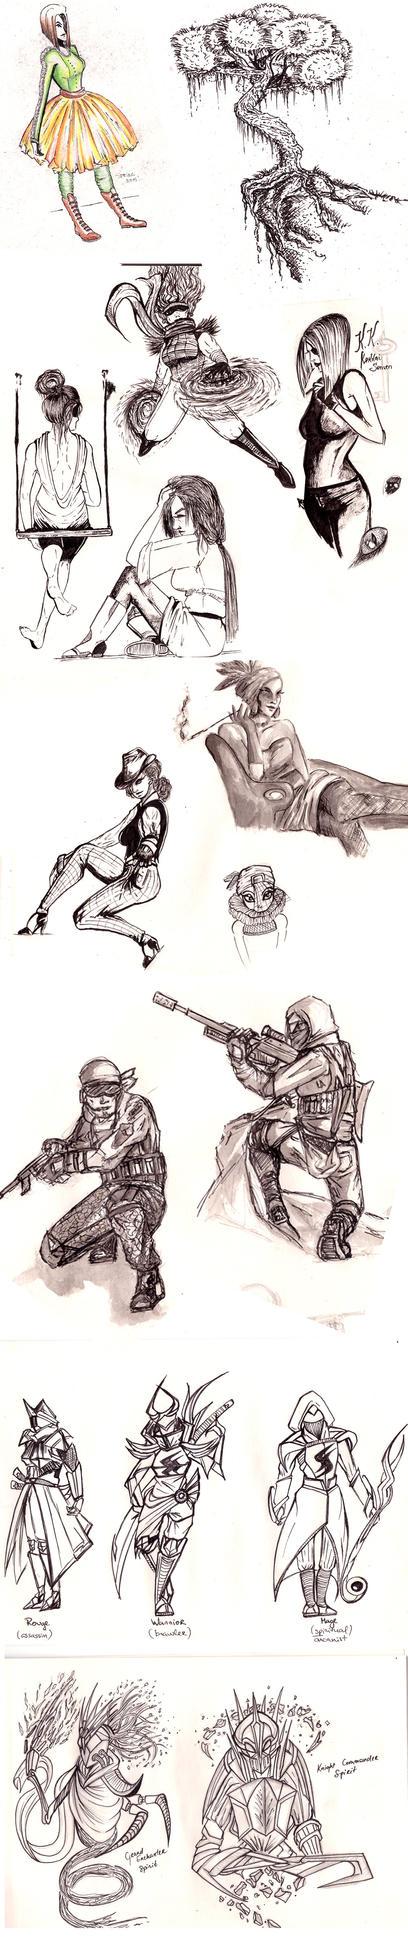 Sketchdump I by MikoKristy